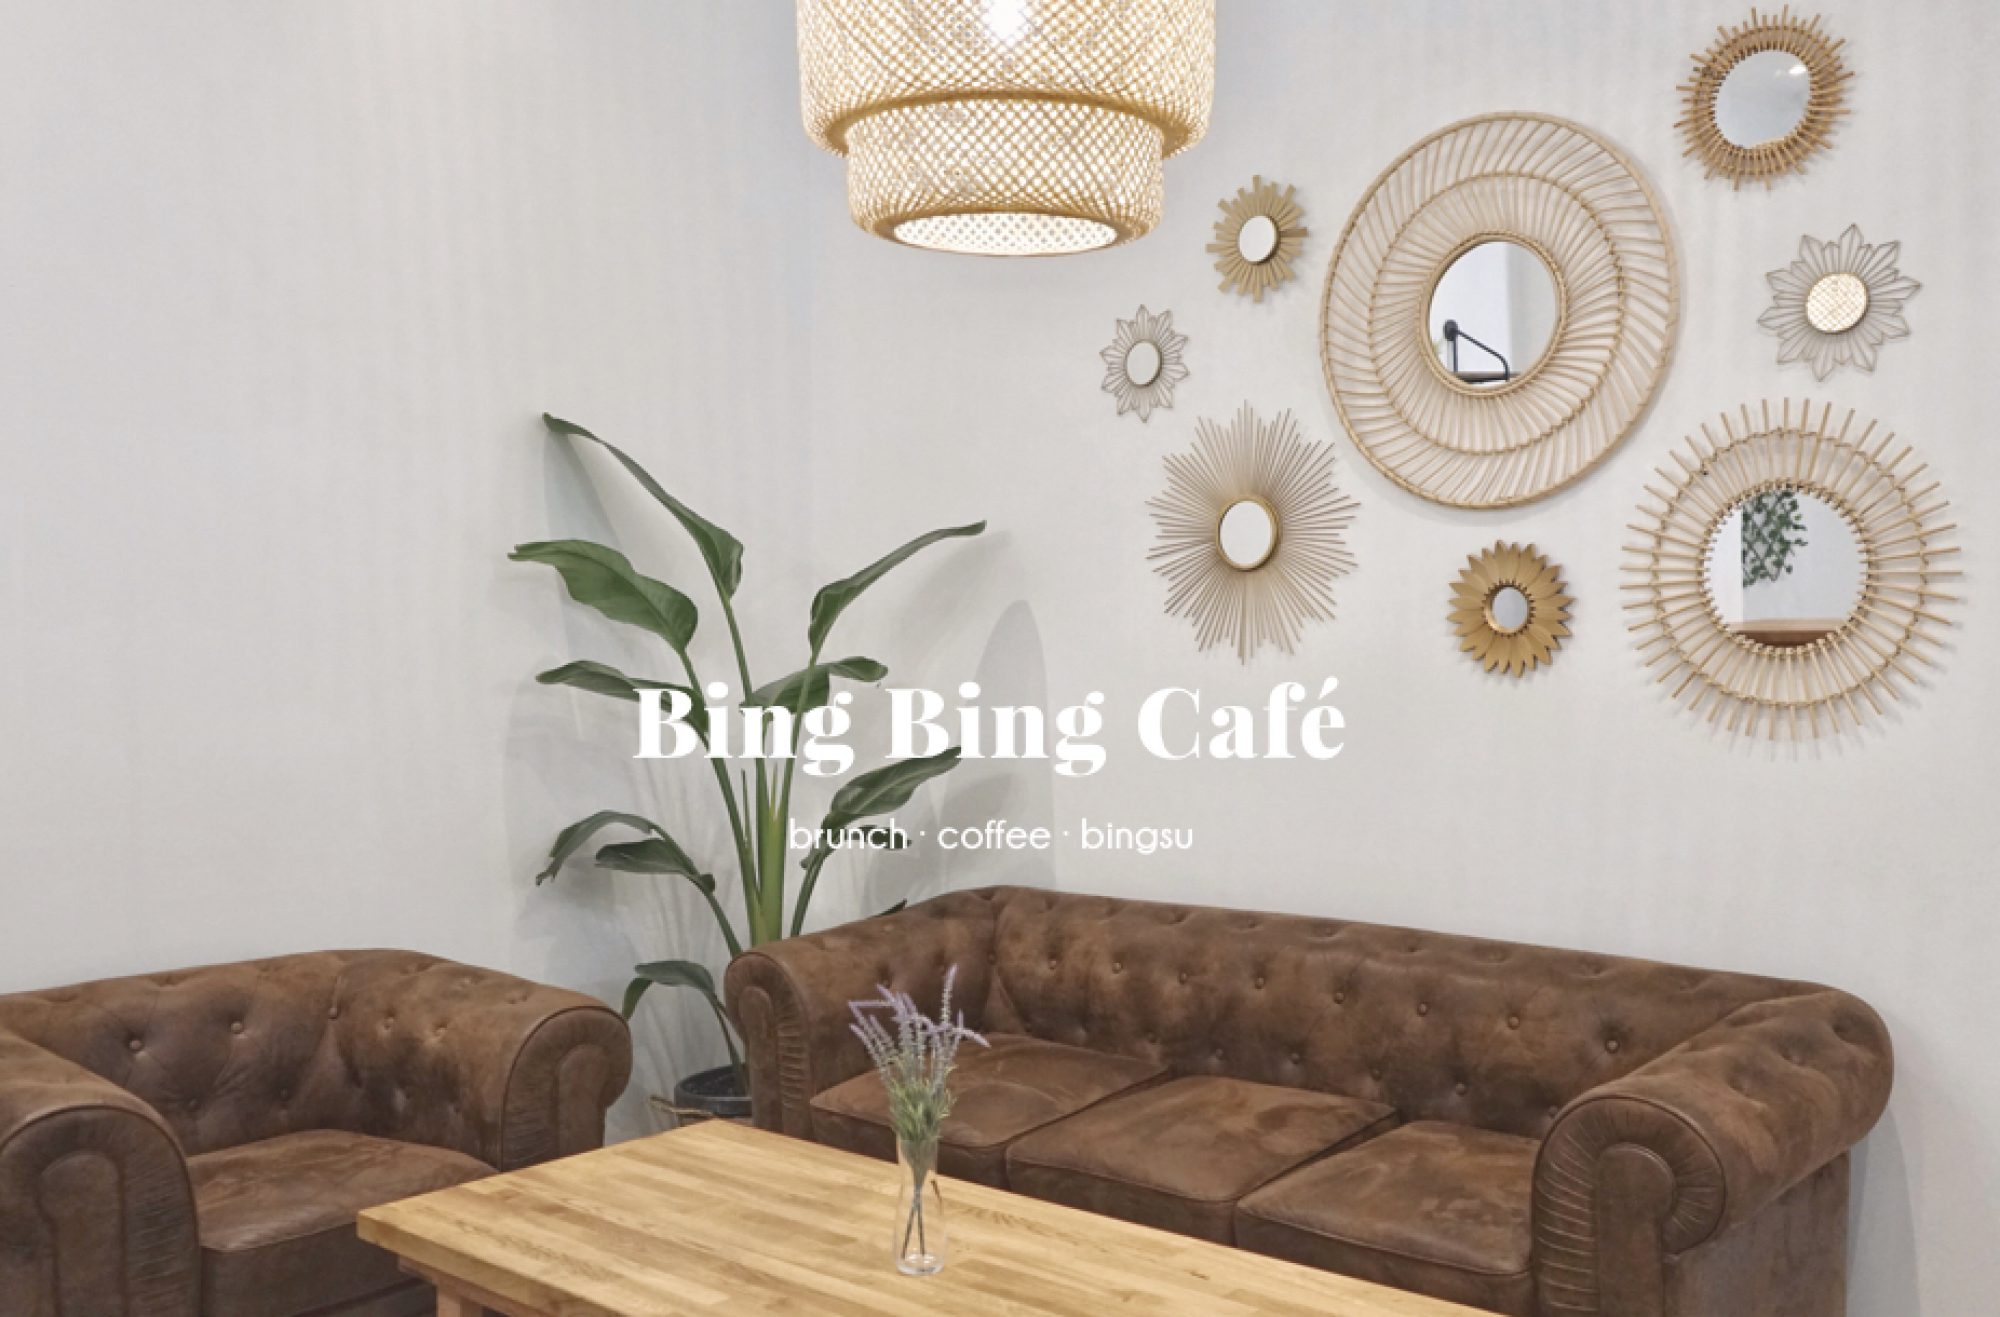 Bing Bing Café